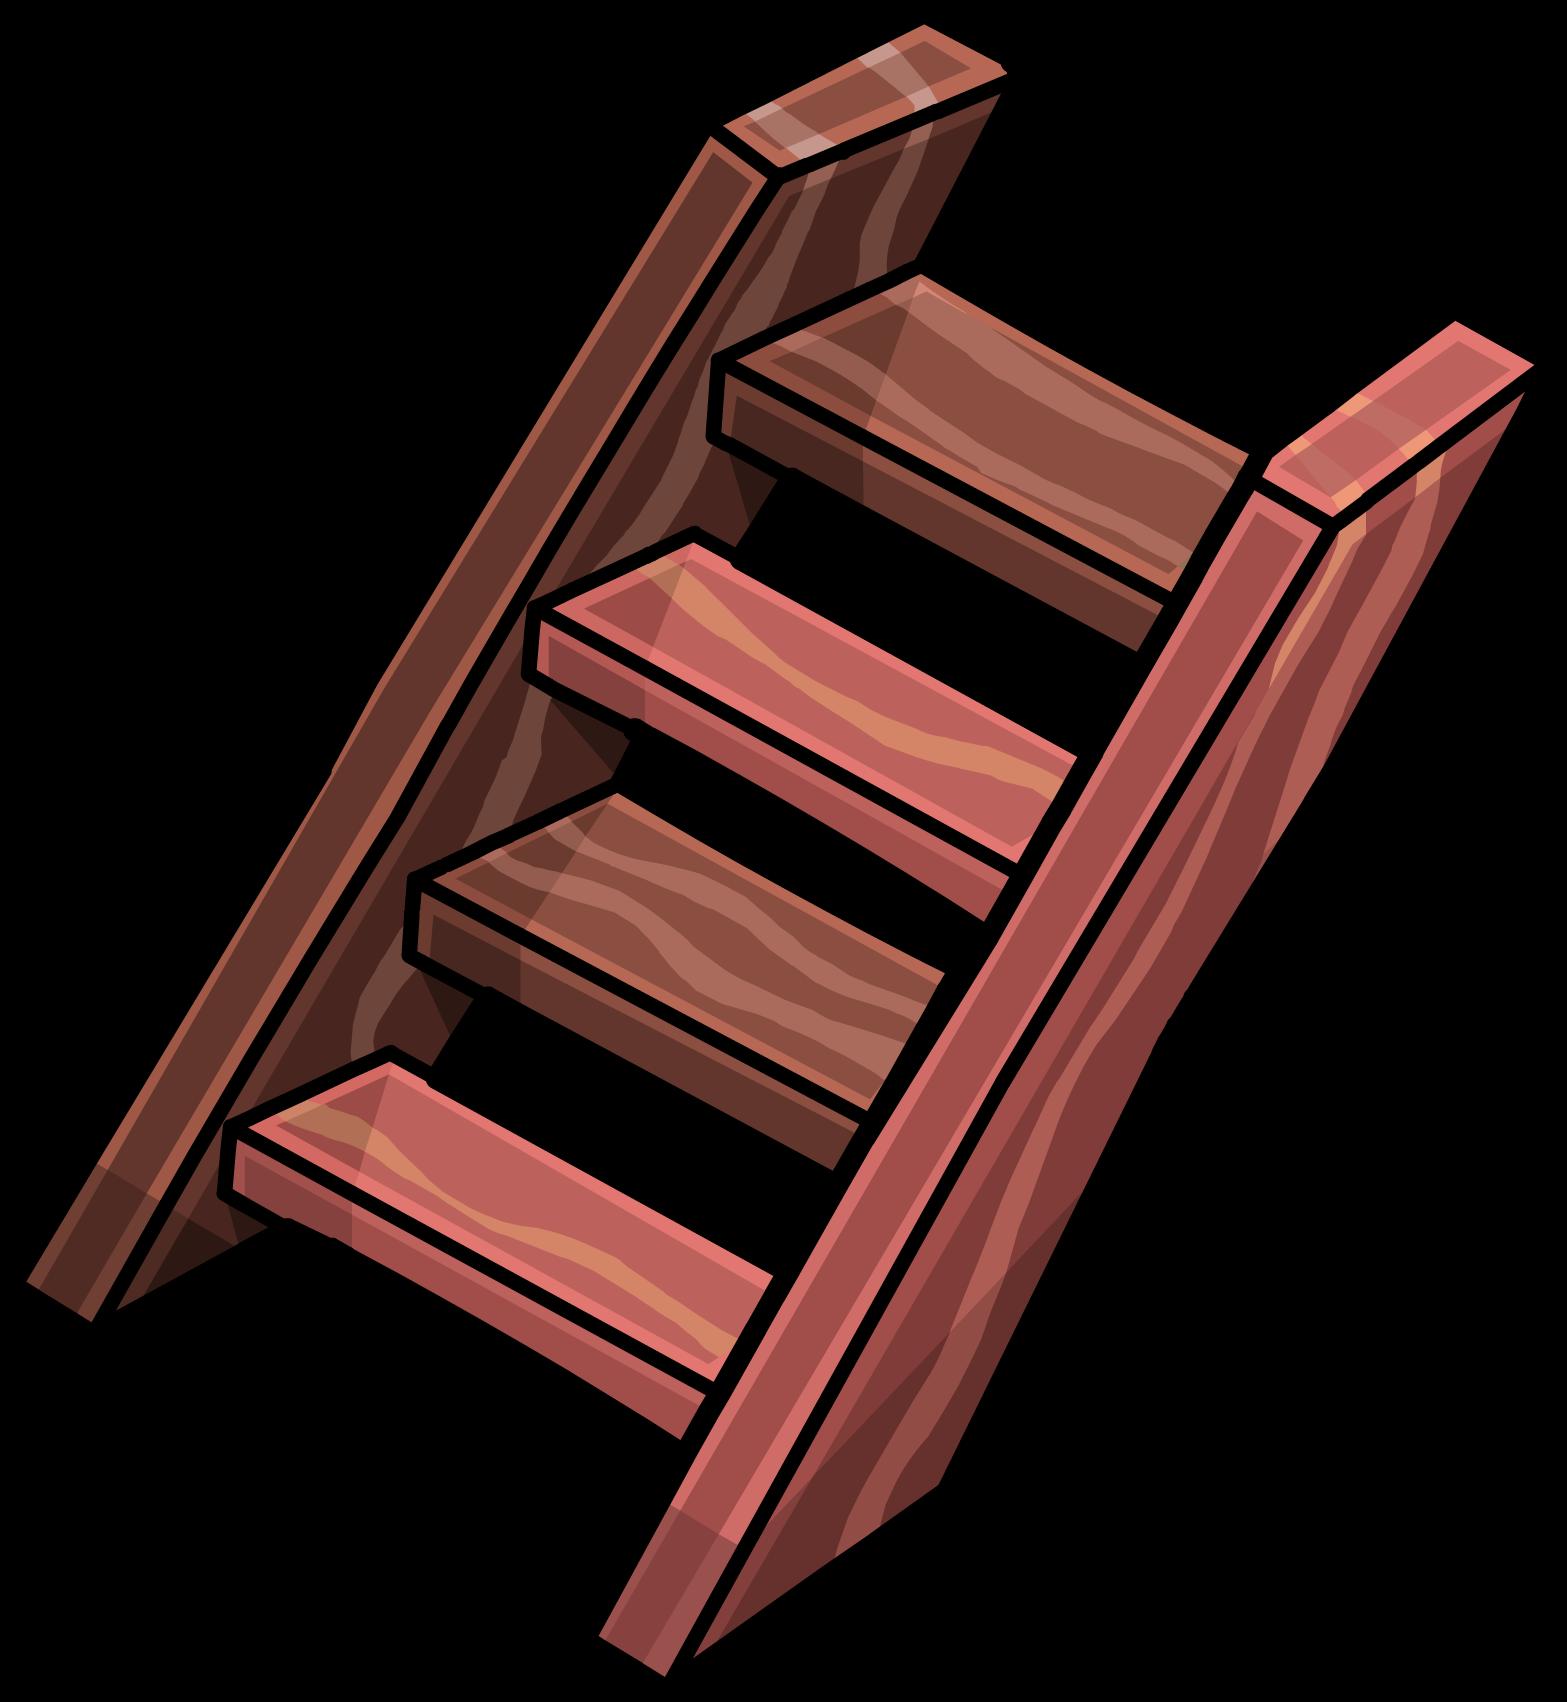 Escalera de madera club penguin wiki fandom powered by - Escalera madera ...